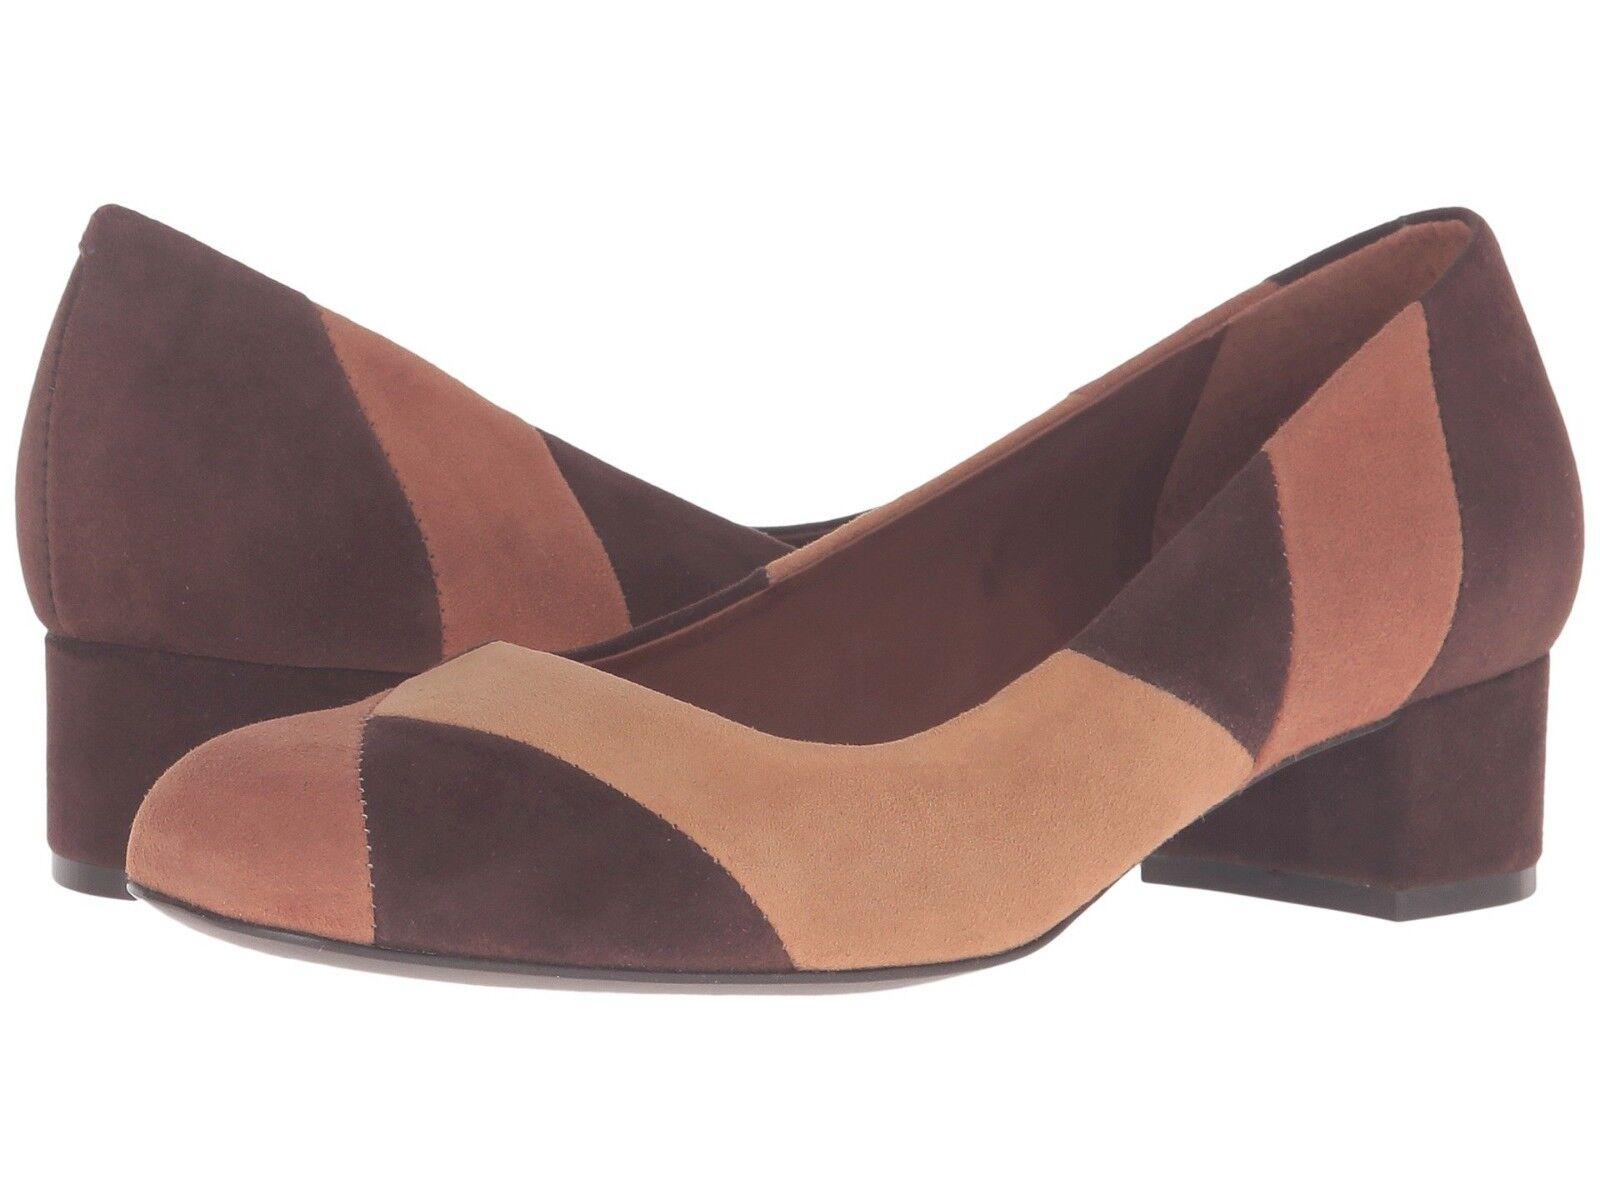 wholesape economico Bernardo Donna    Roxanne Suede Heels Pumps Retail  168 Dimensione 10  fantastica qualità